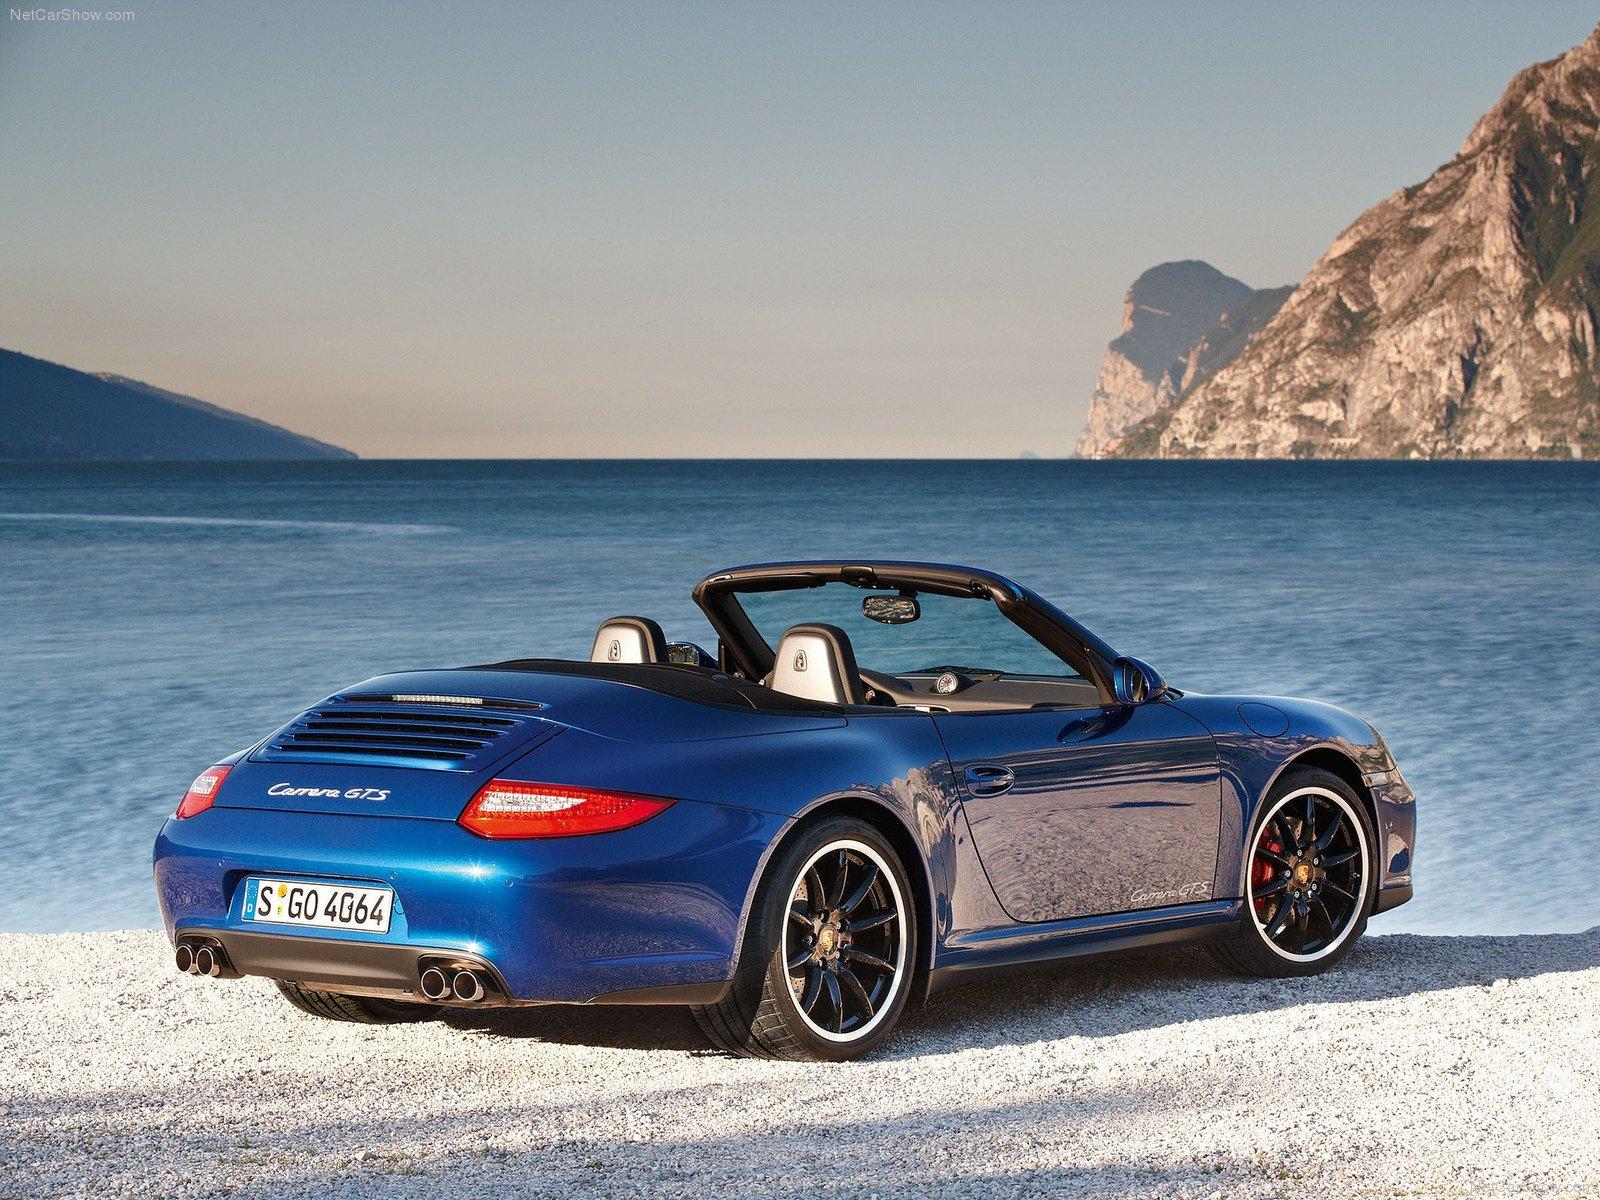 Used Porsche 911 For Sale >> 2011 Blue Porsche 911 Carrera GTS wallpapers